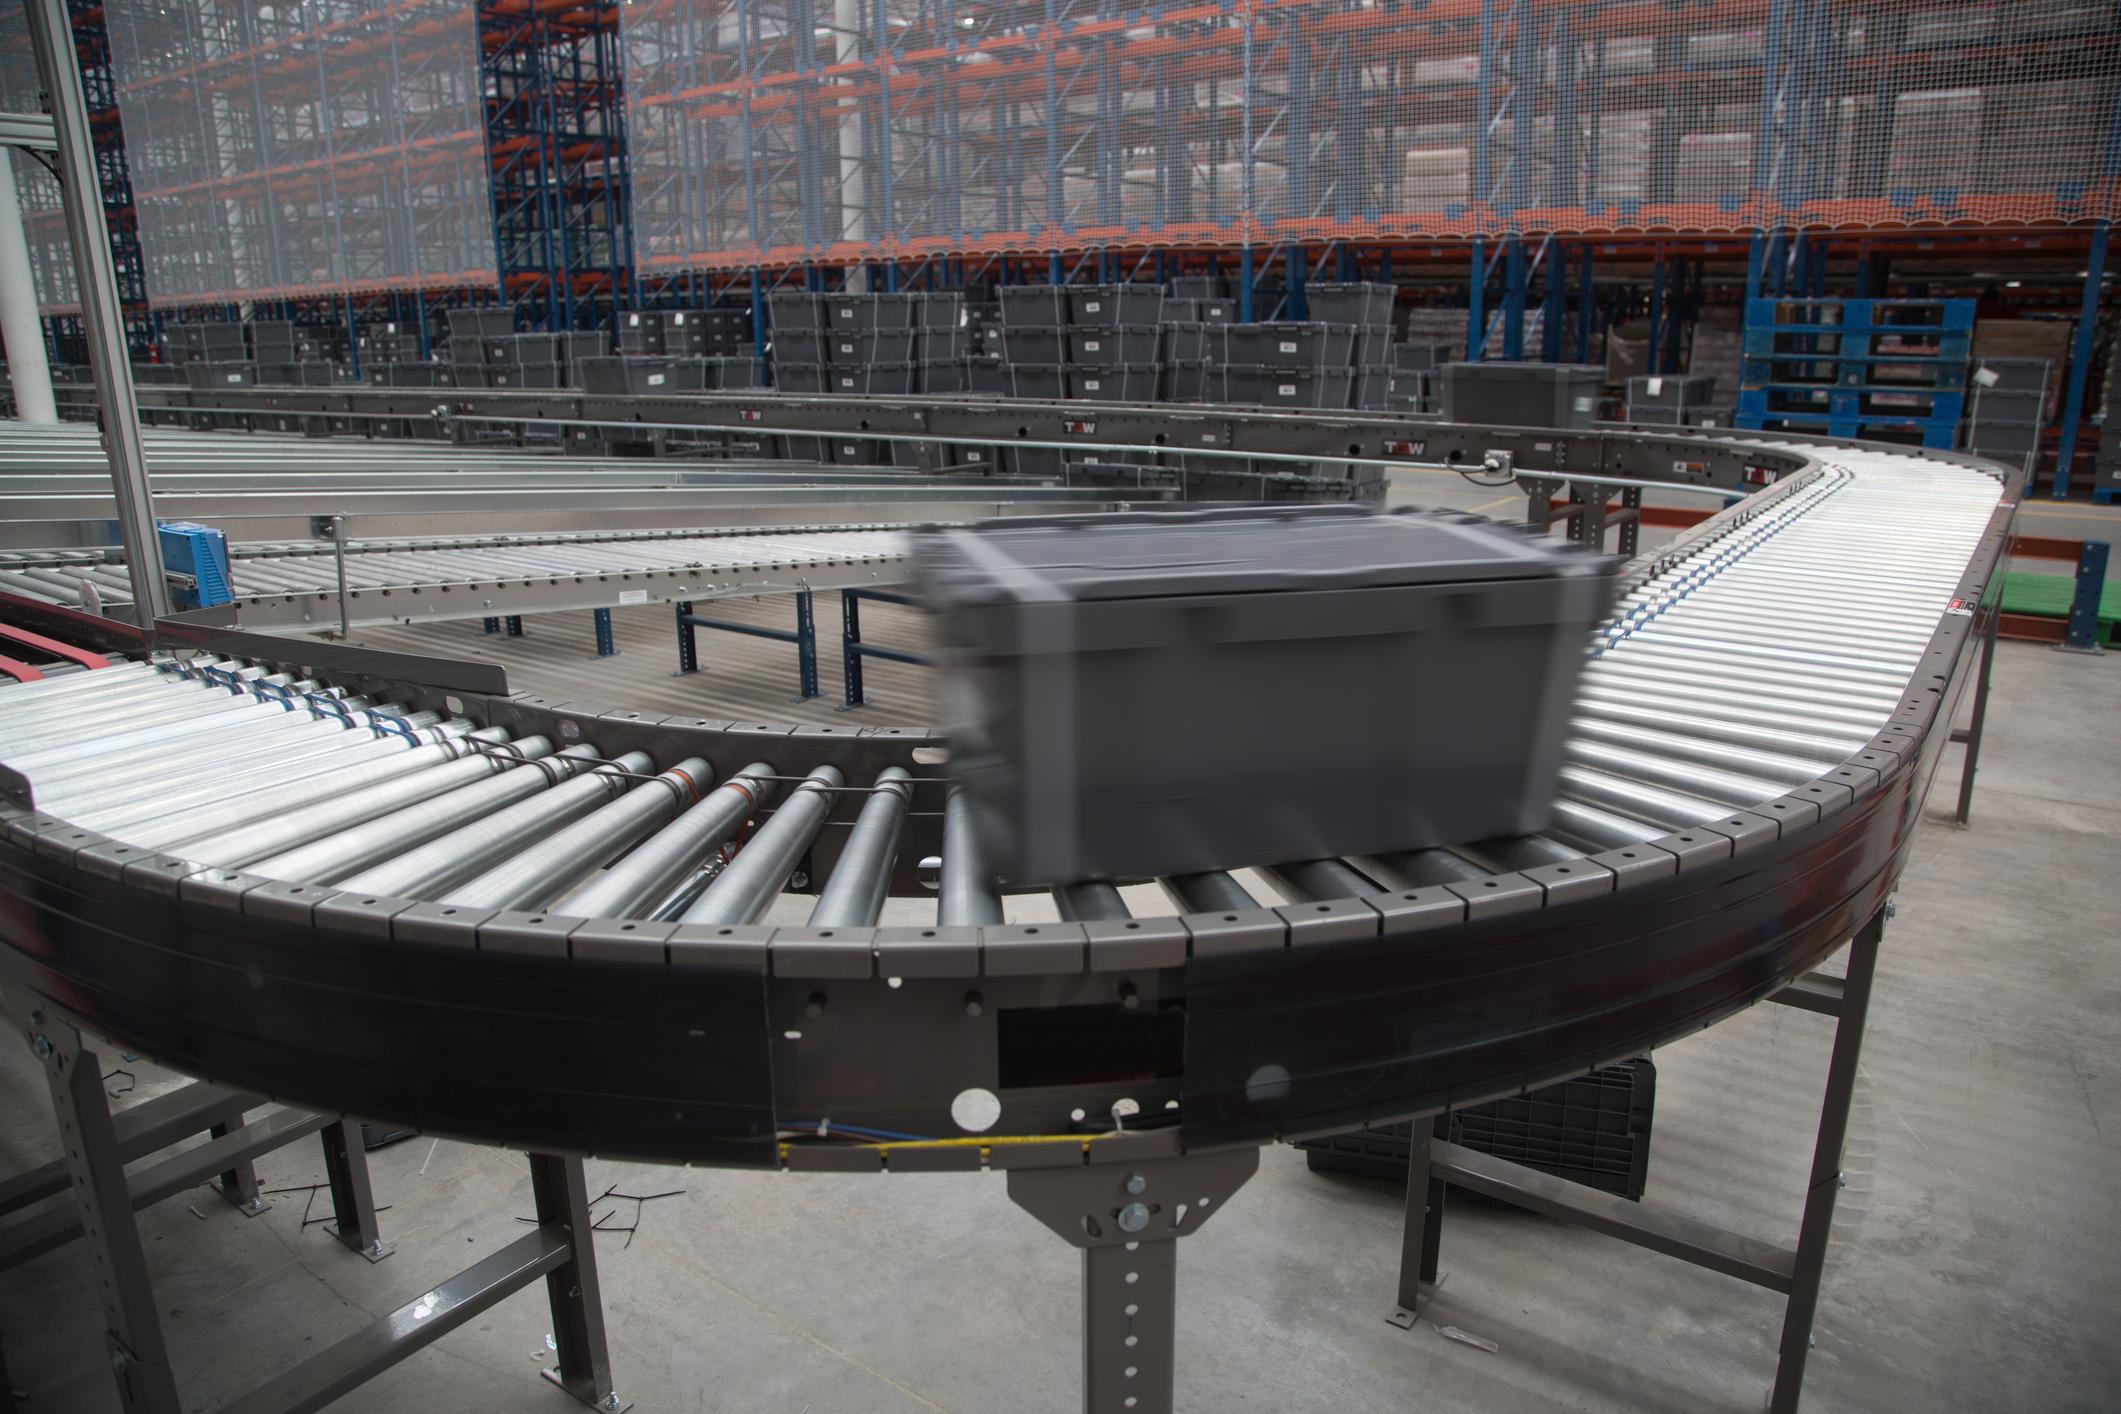 A bin moves on a conveyor belt in a warehouse